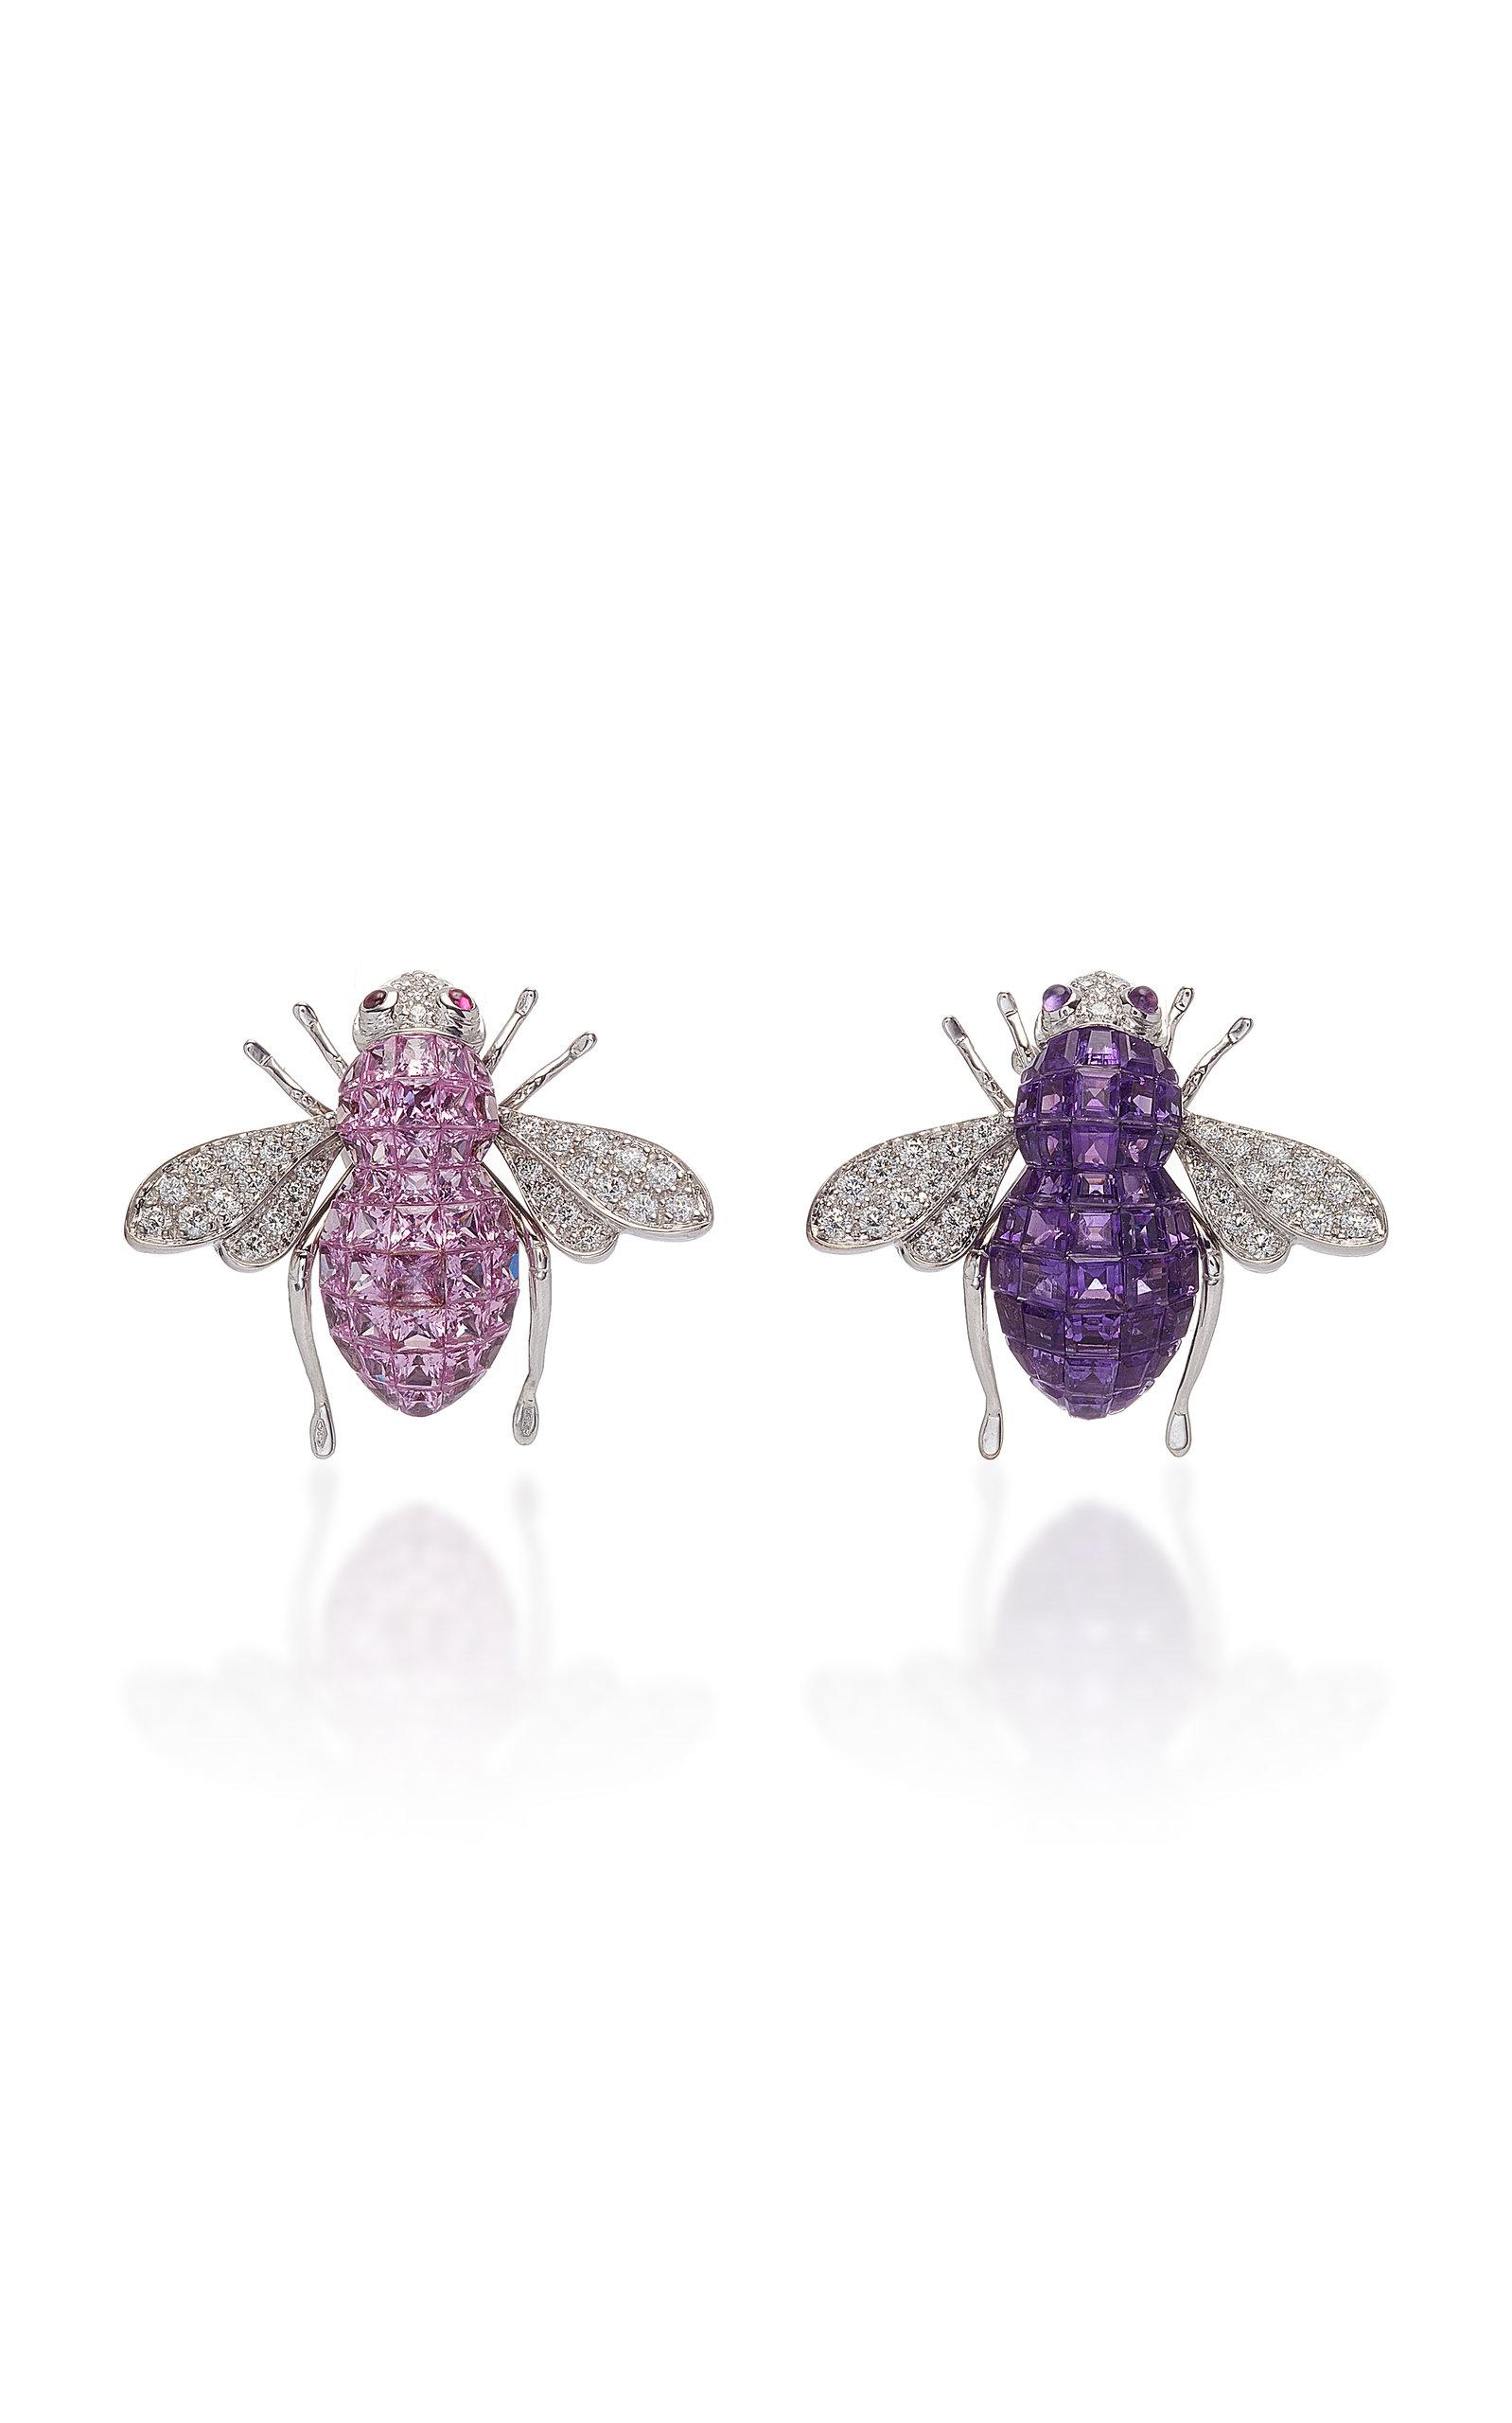 SABBADINI White Gold Diamond Amethyst And Sapphire Bee Earrings in Purple